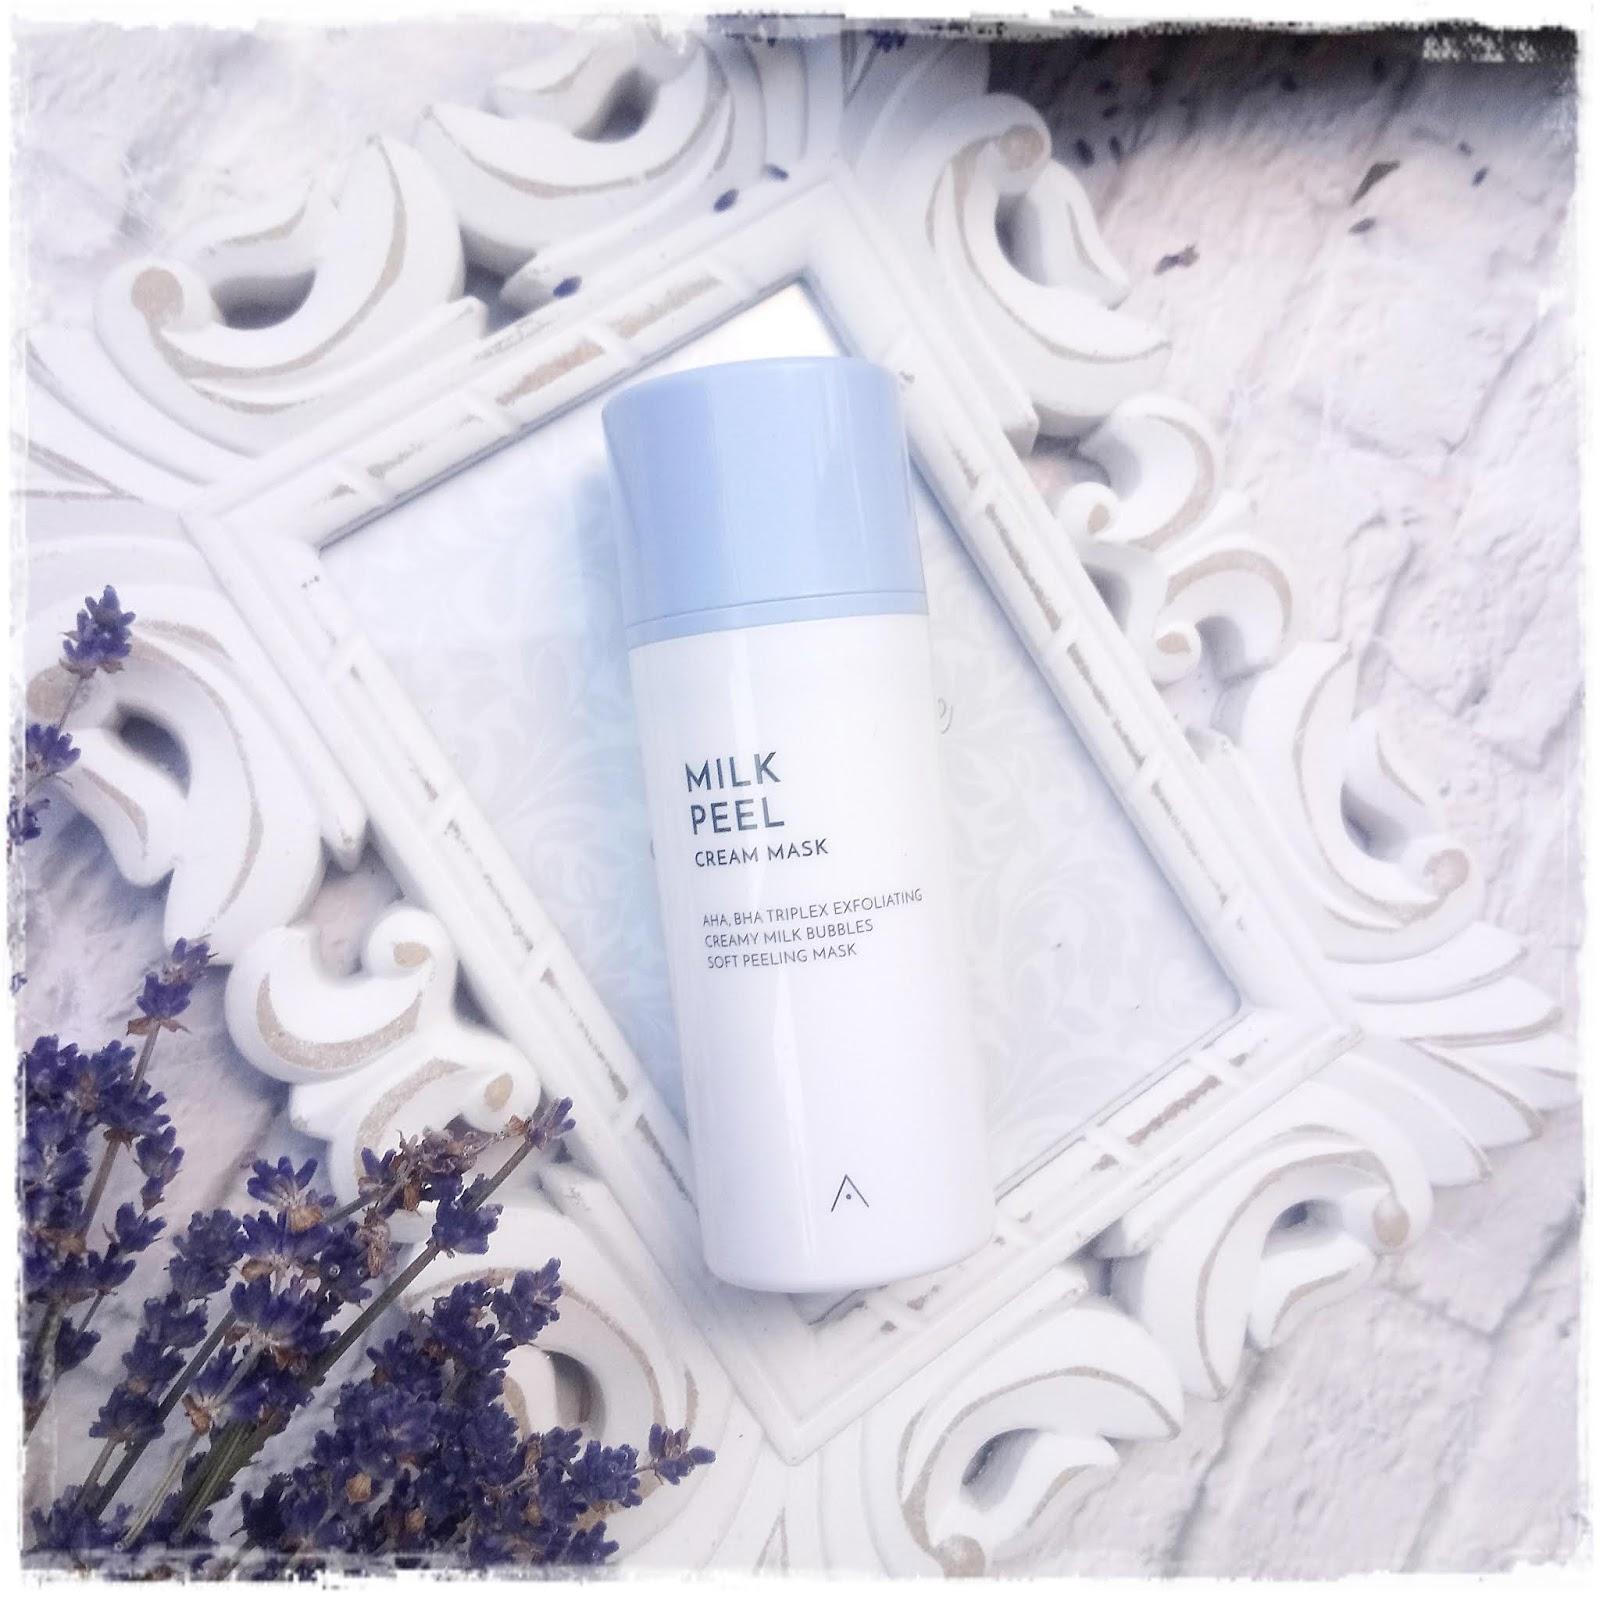 Althea Milk Peel Cream Mask, Kremowy Peeling Maska Prosto  z Koreii